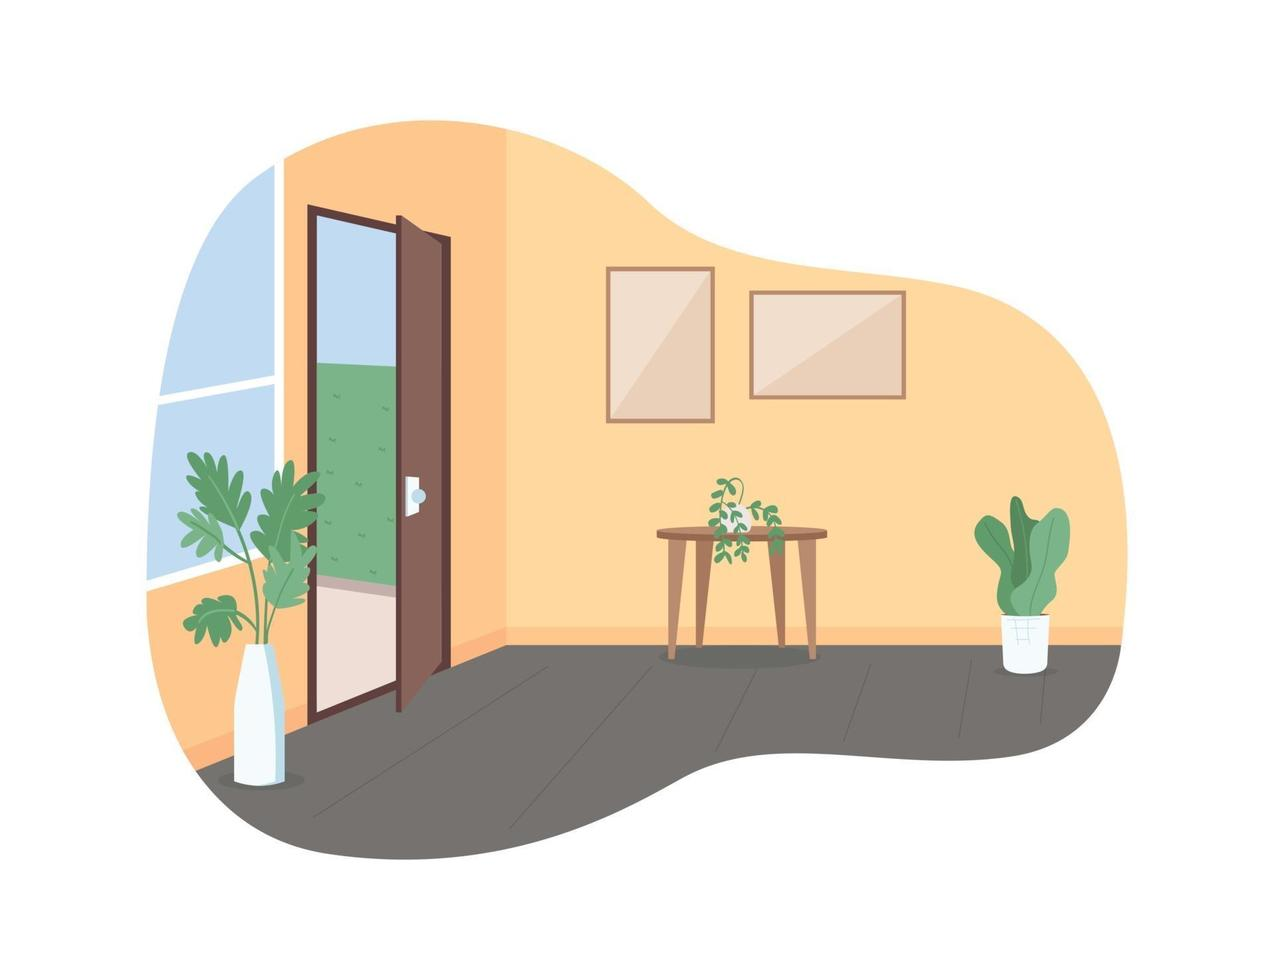 hem hall med öppen dörr 2d vektor webb banner, affisch